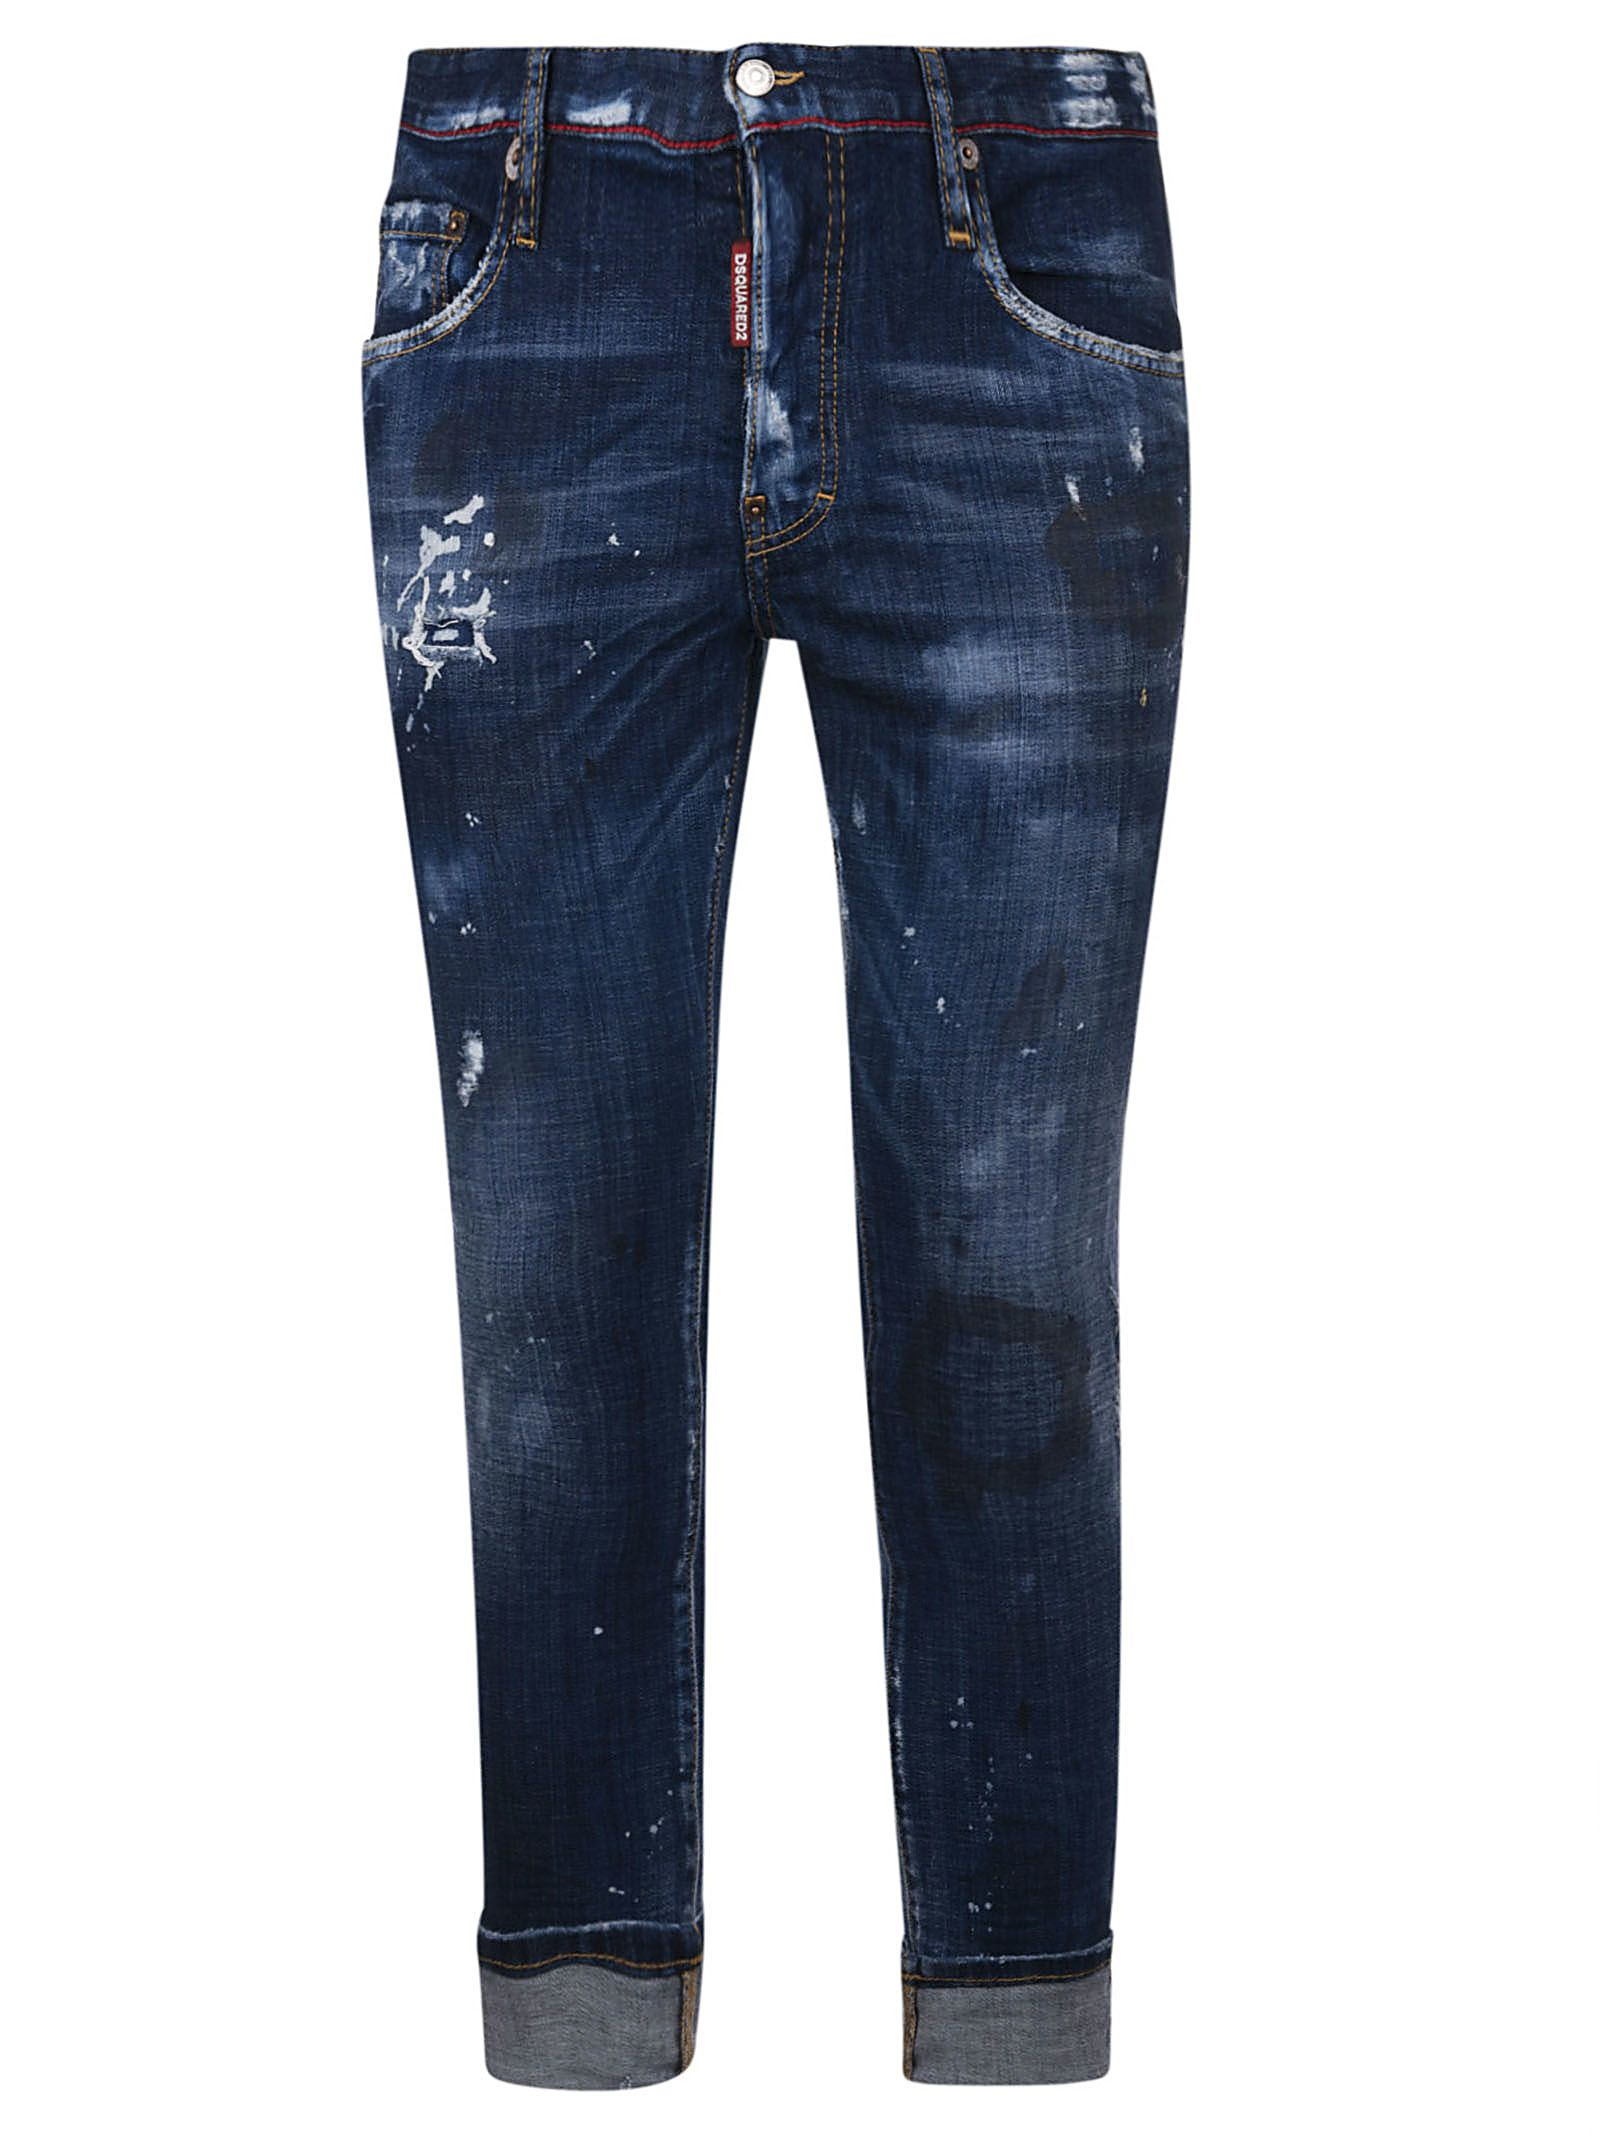 Dsquared2 Skater Distressed Jeans